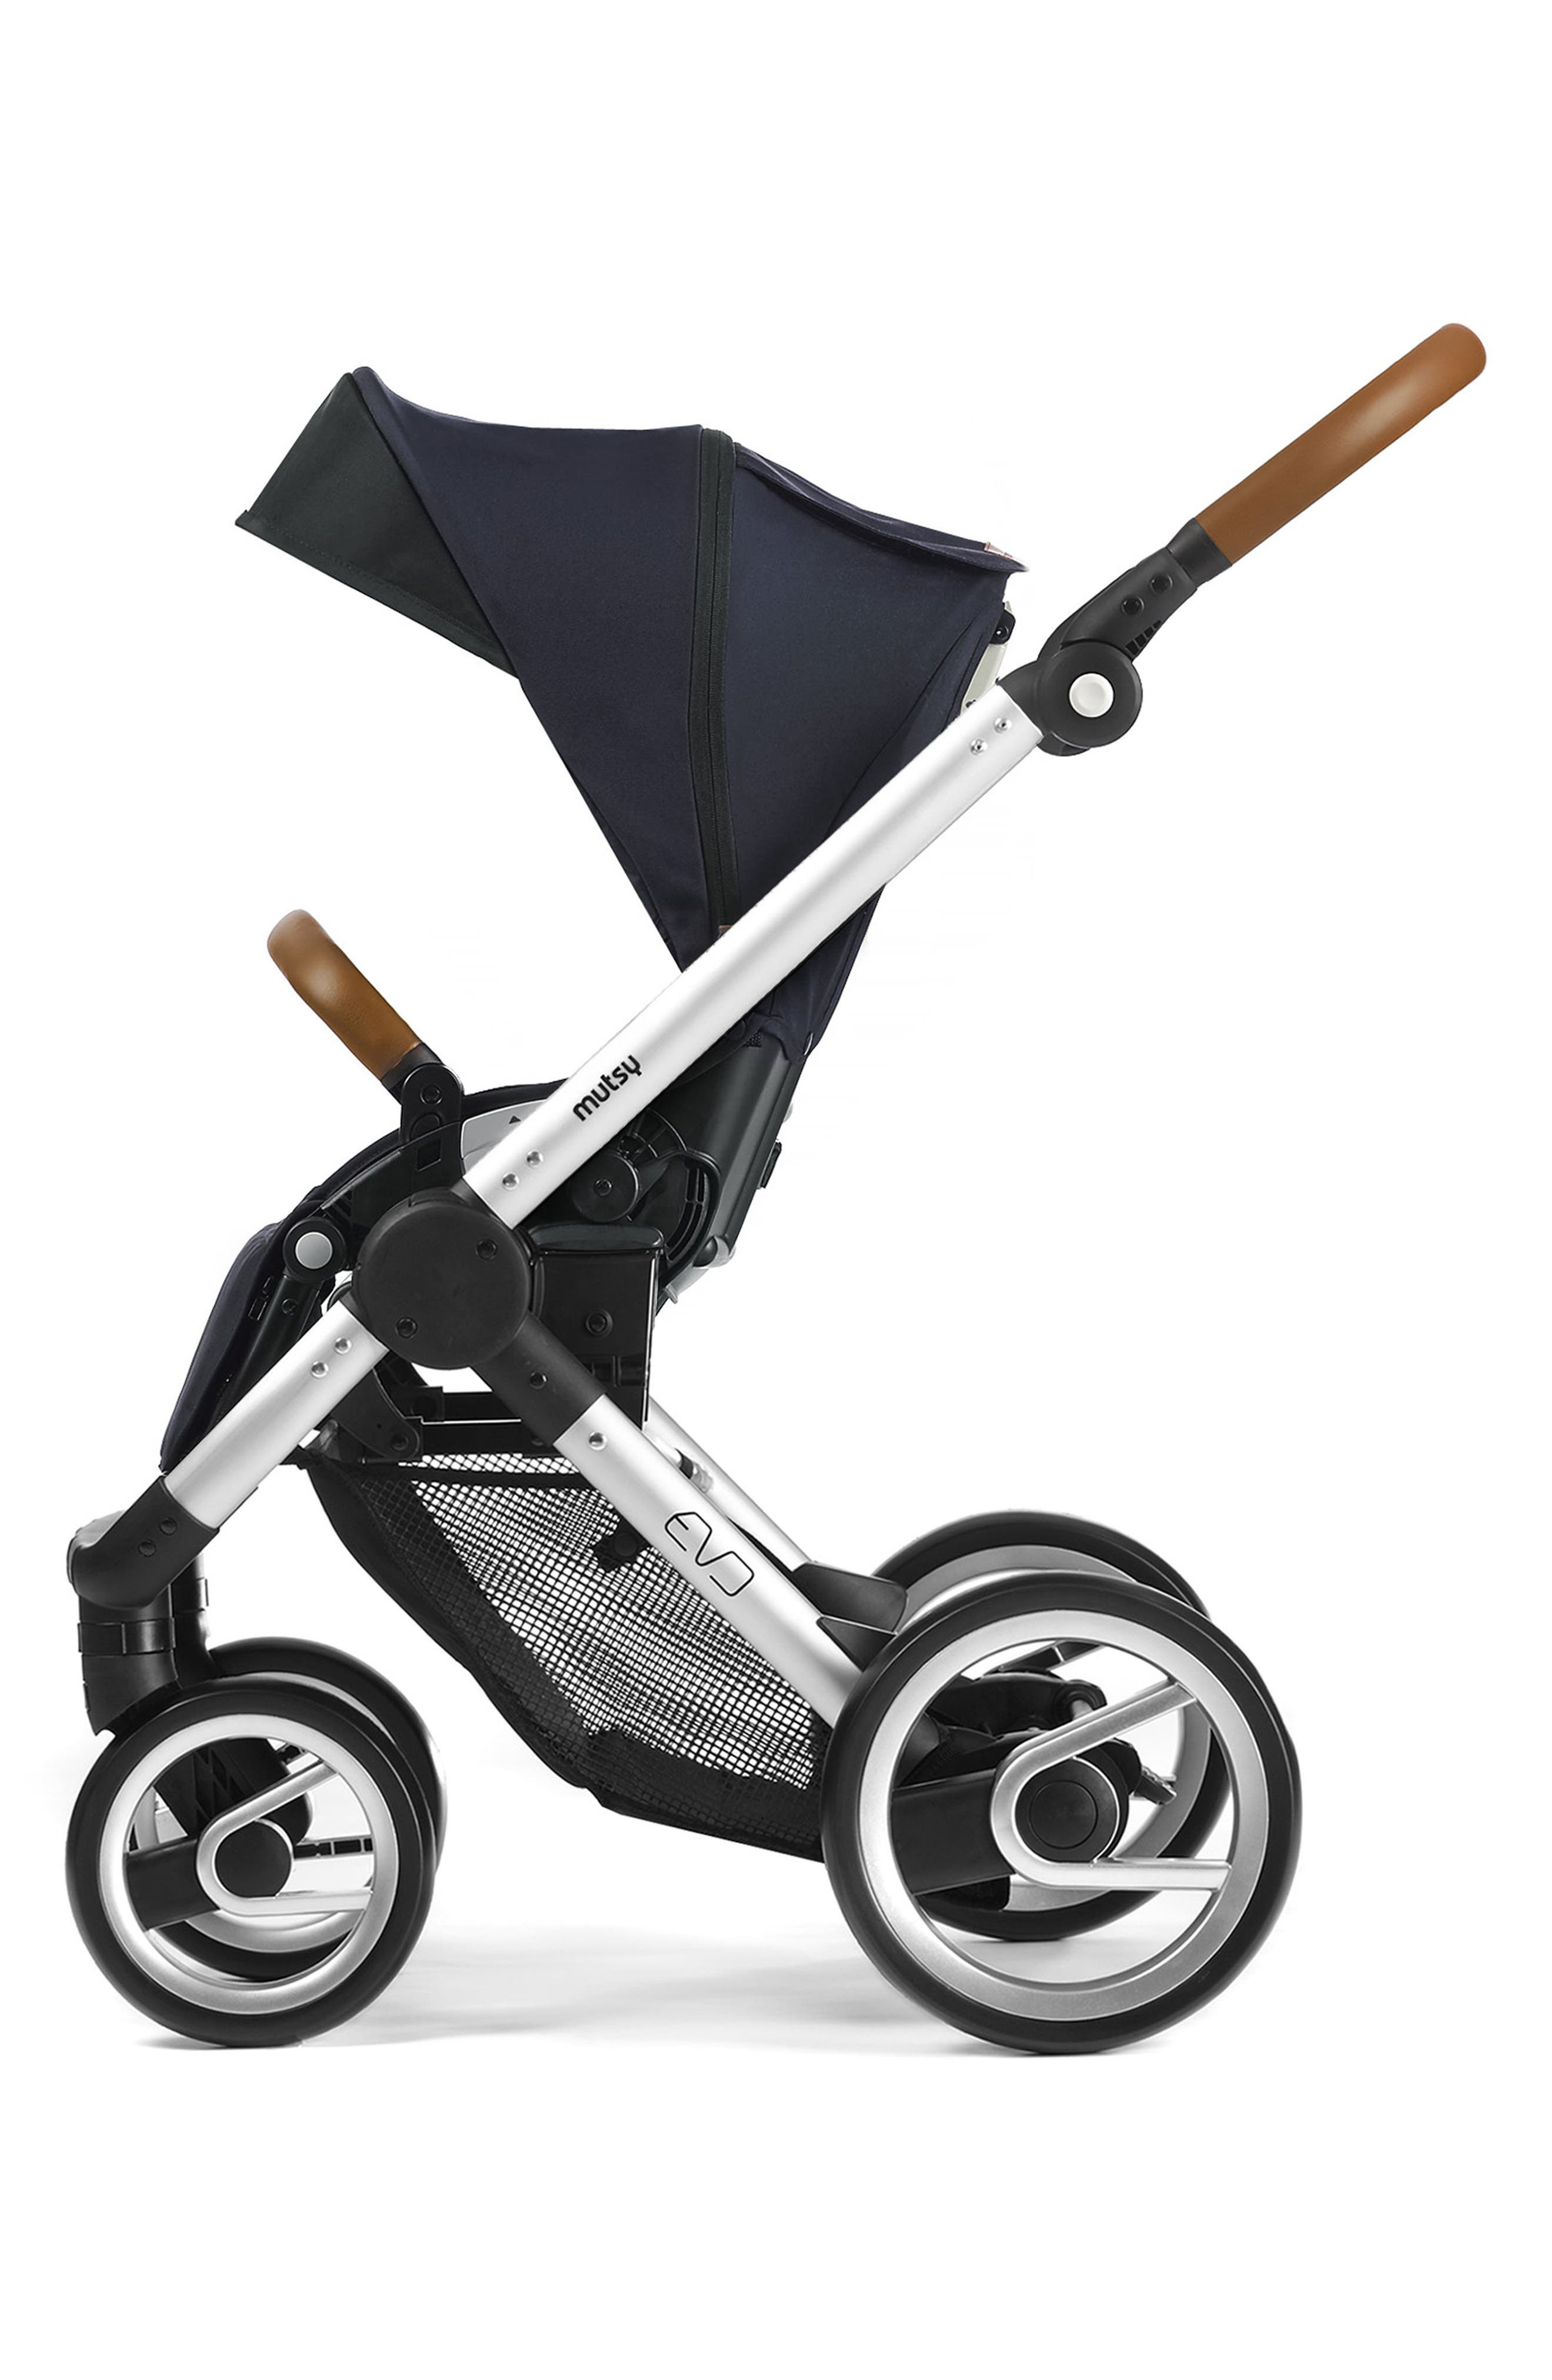 Evo - Urban Nomad Stroller,                             Alternate thumbnail 4, color,                             Silver/ Blue